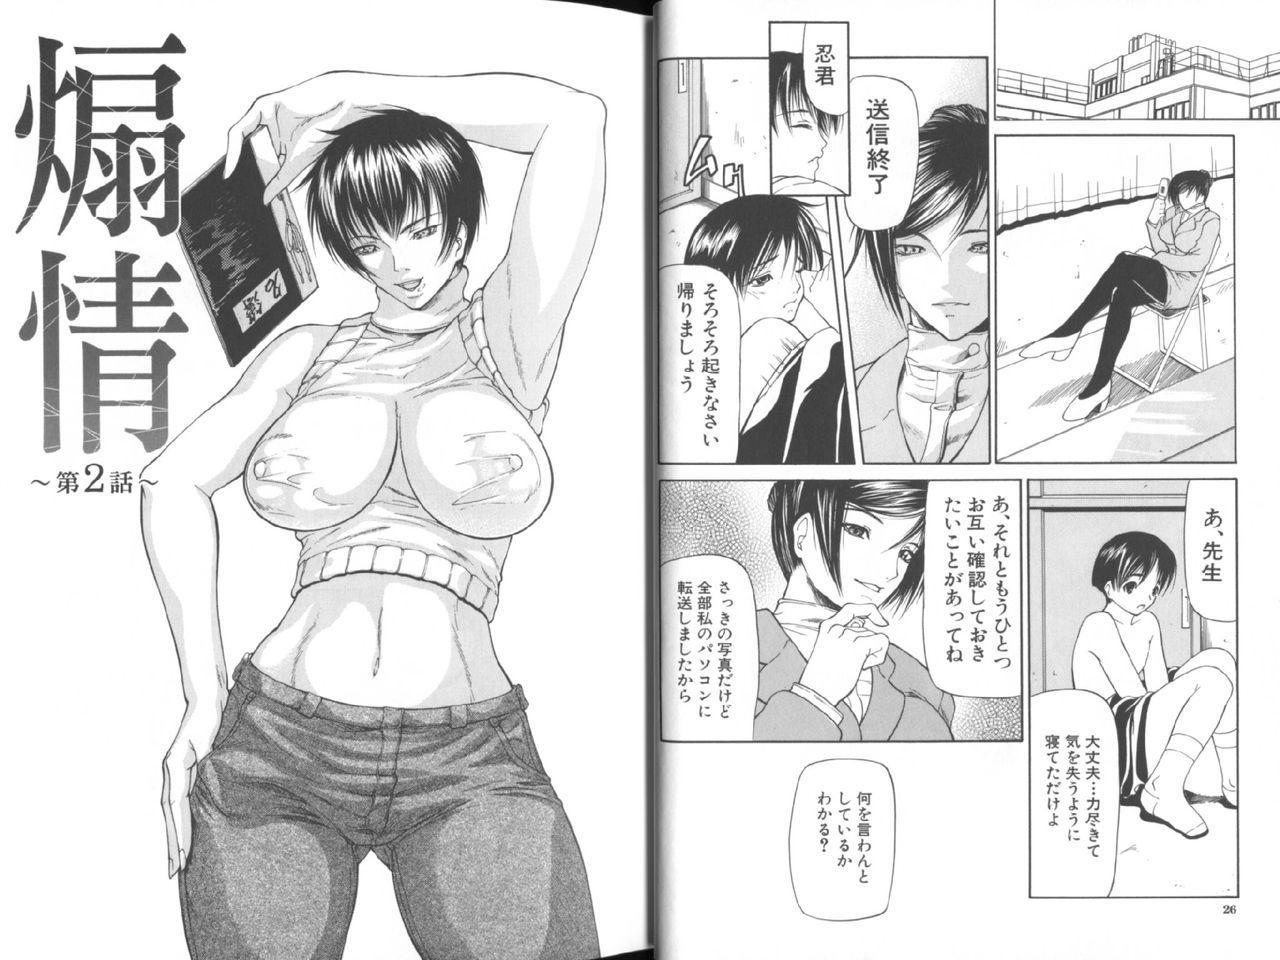 Senjou - A Desire is Instigated 14